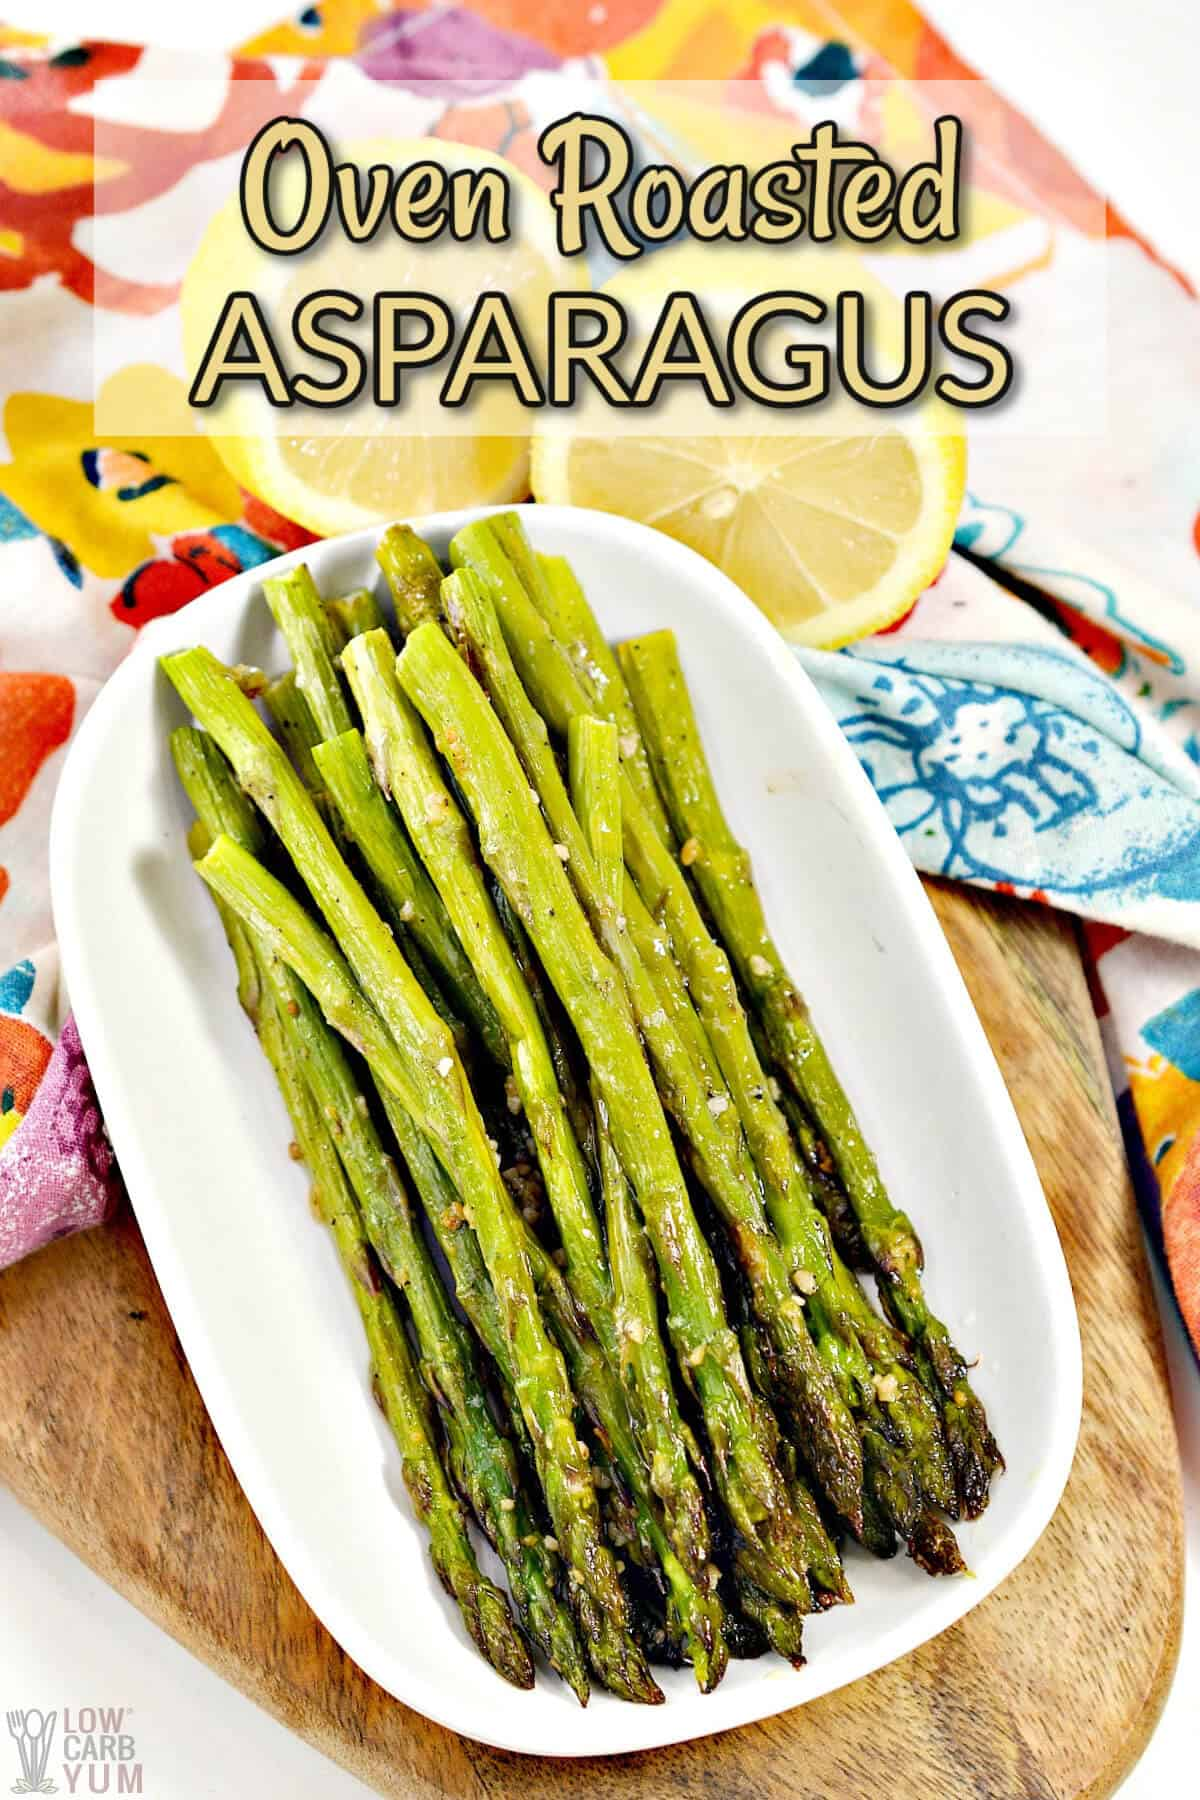 oven roasted asparagus pinterest image